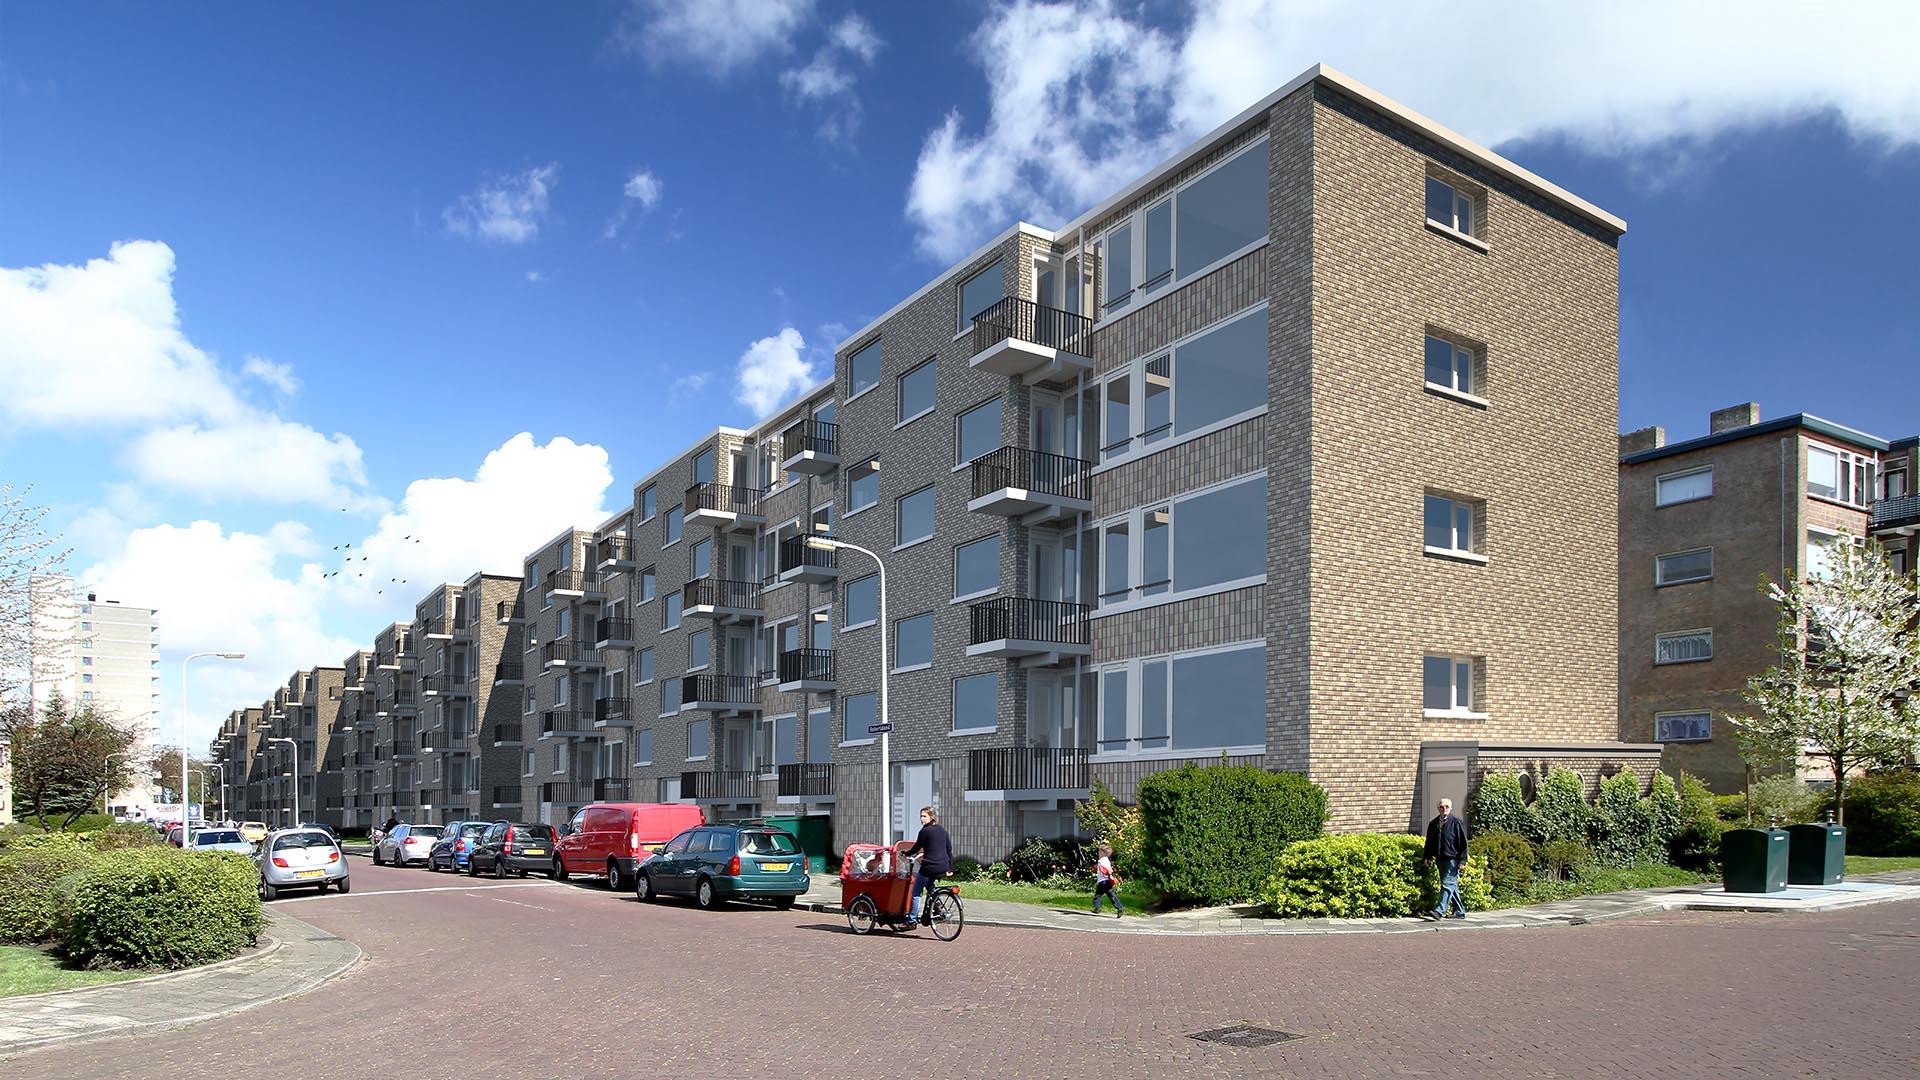 Architectenbureau Den Haag : Nxt architectuur en bouwkunde architectenbureau en bouwkundig